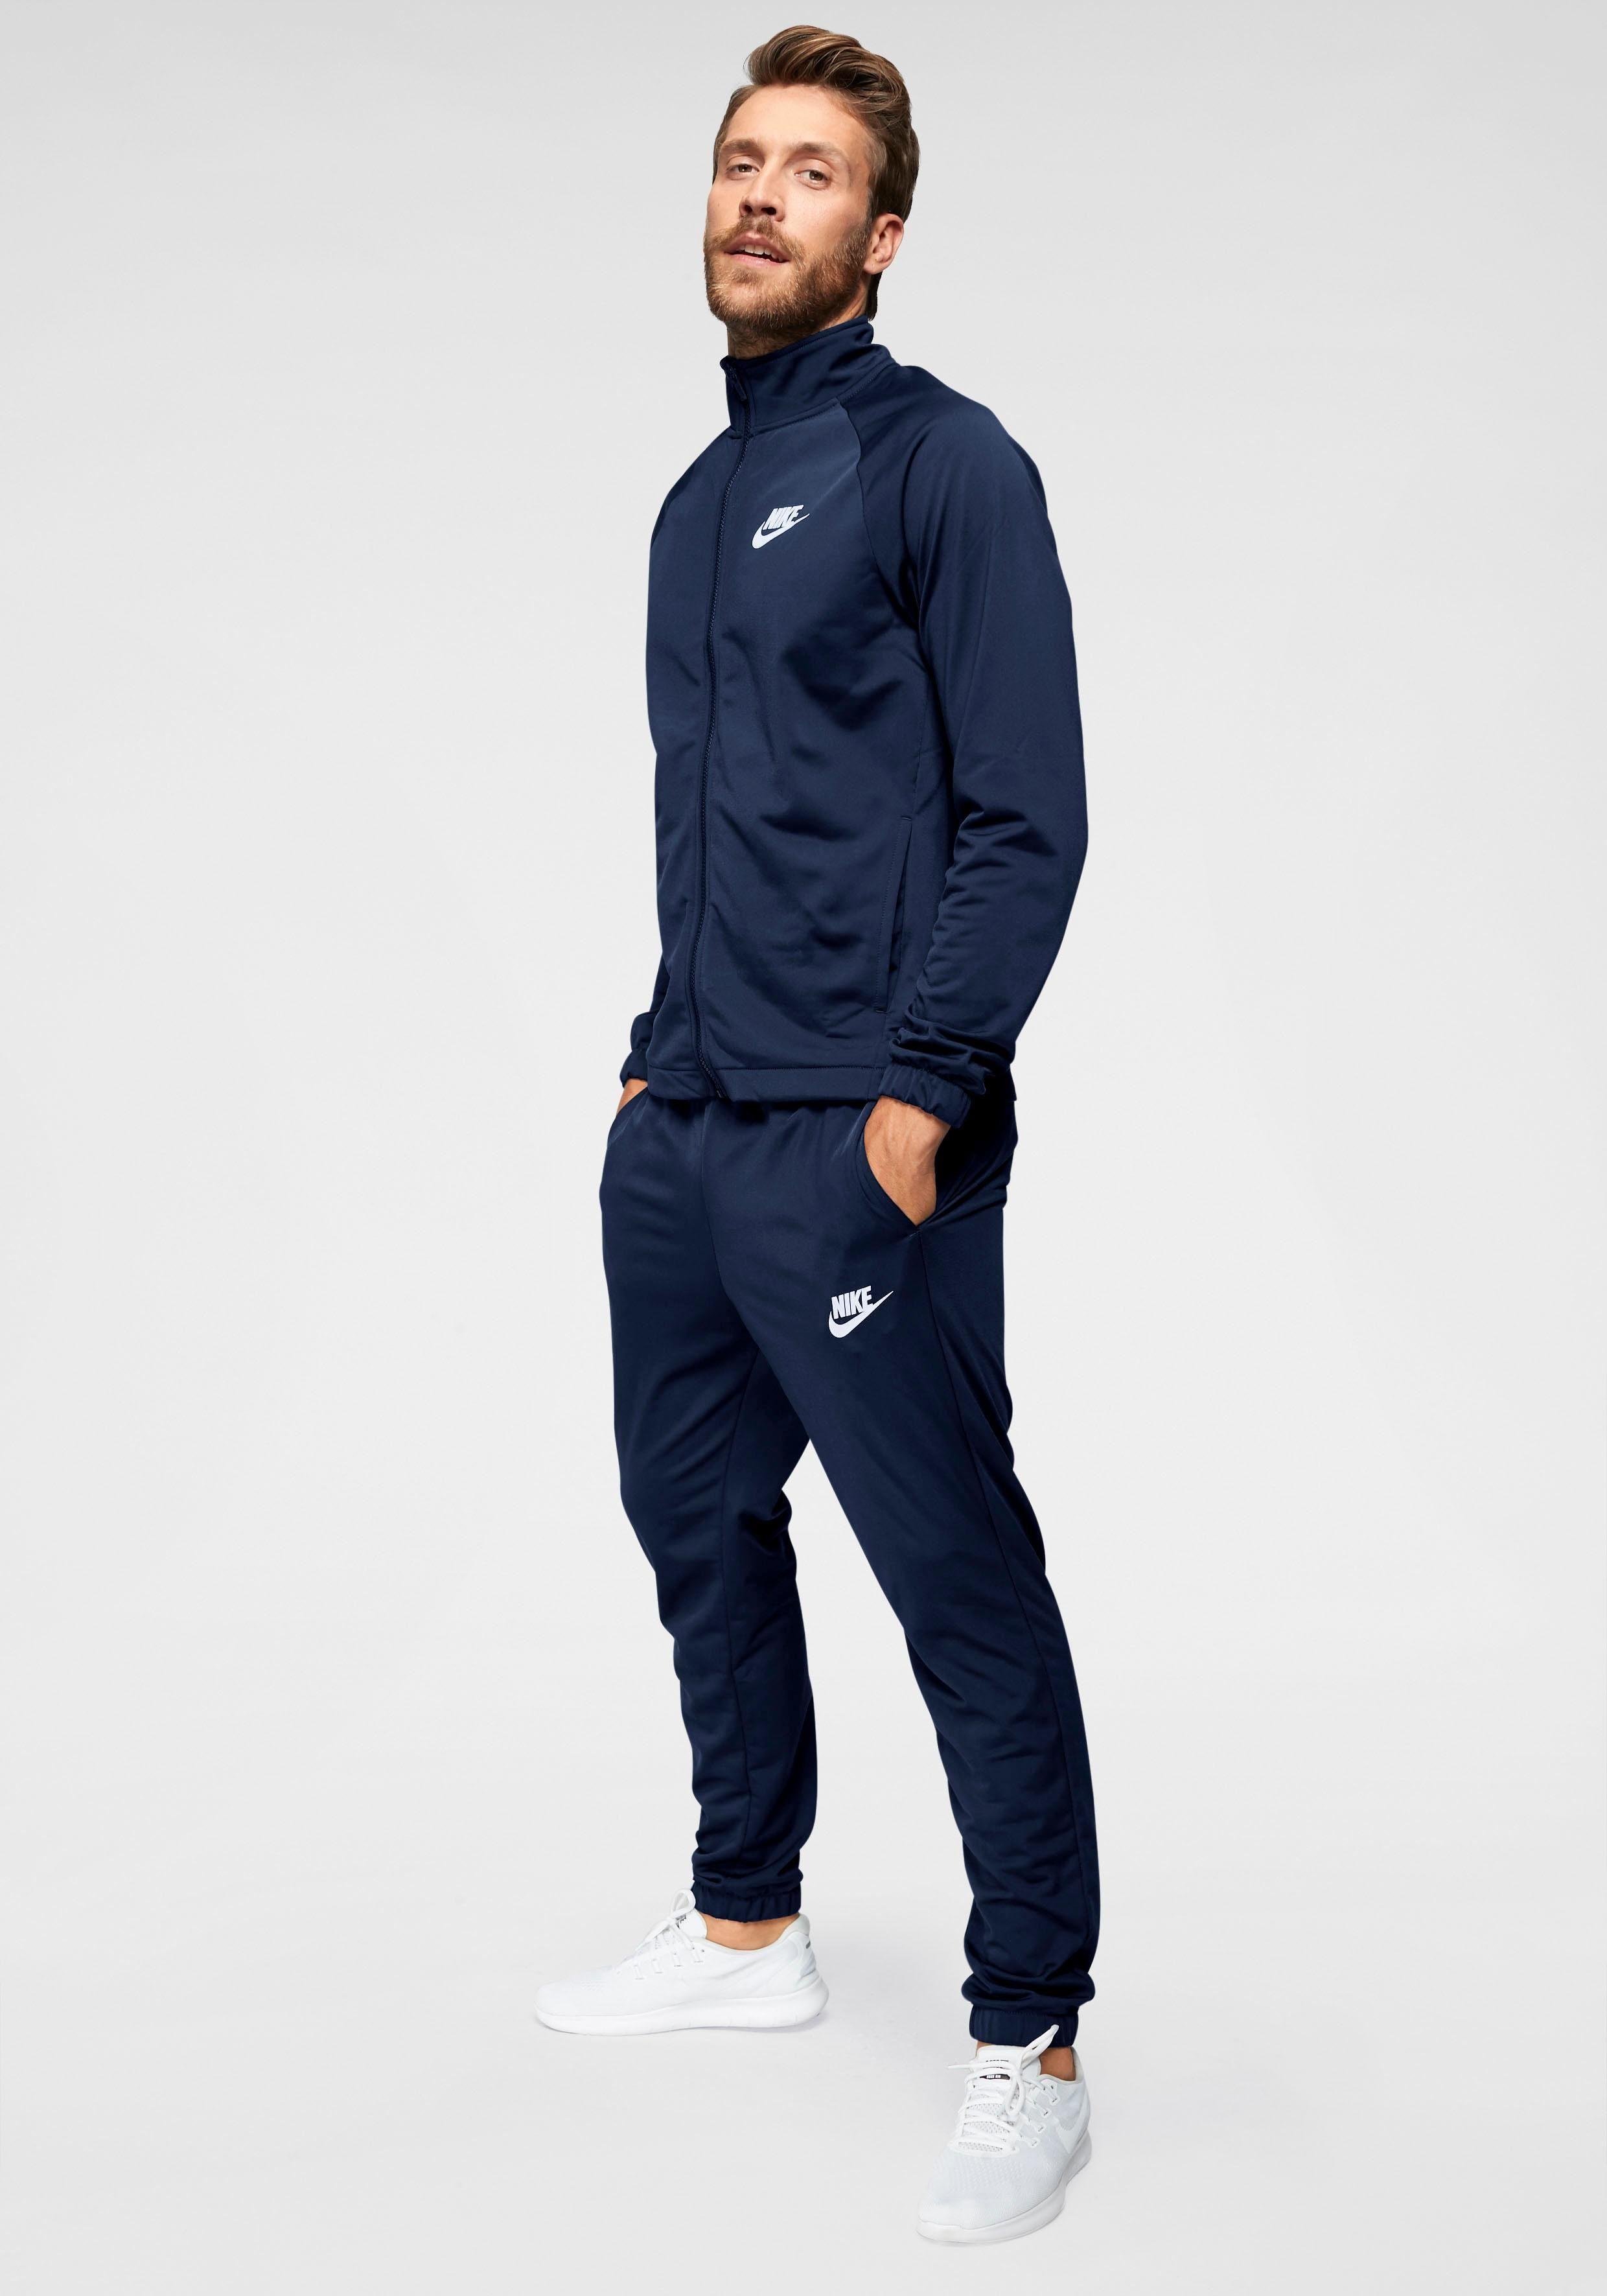 Nike Sportswear Trainingsanzug »M NSW TRK SUIT PK BASIC« (Set, 2 tlg) online kaufen | OTTO